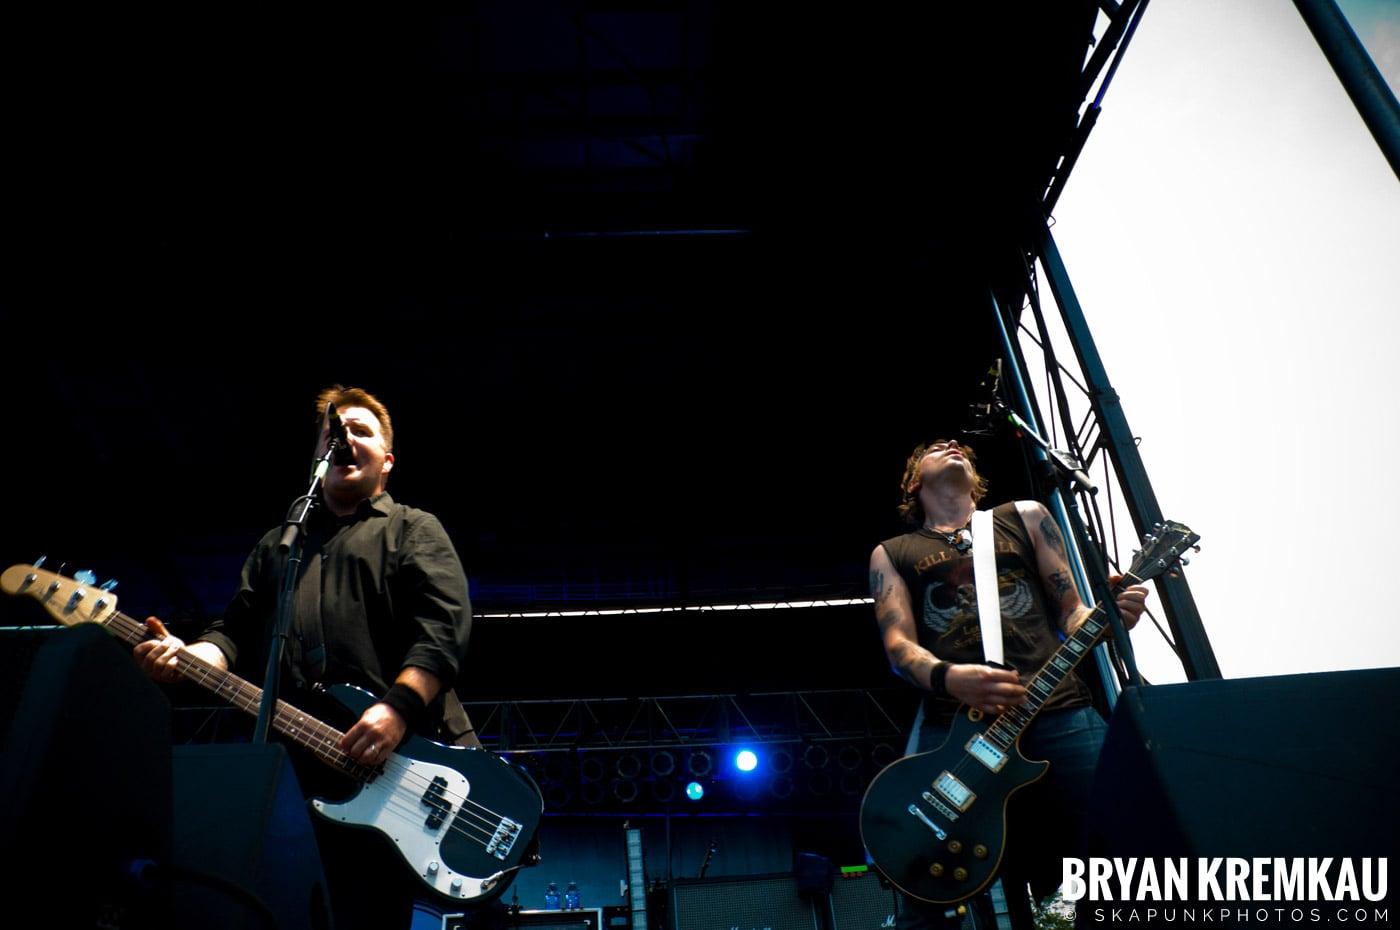 Dropkick Murphys @ Starland Summer Campout, Sayreville NJ - 7.13.08 (19)